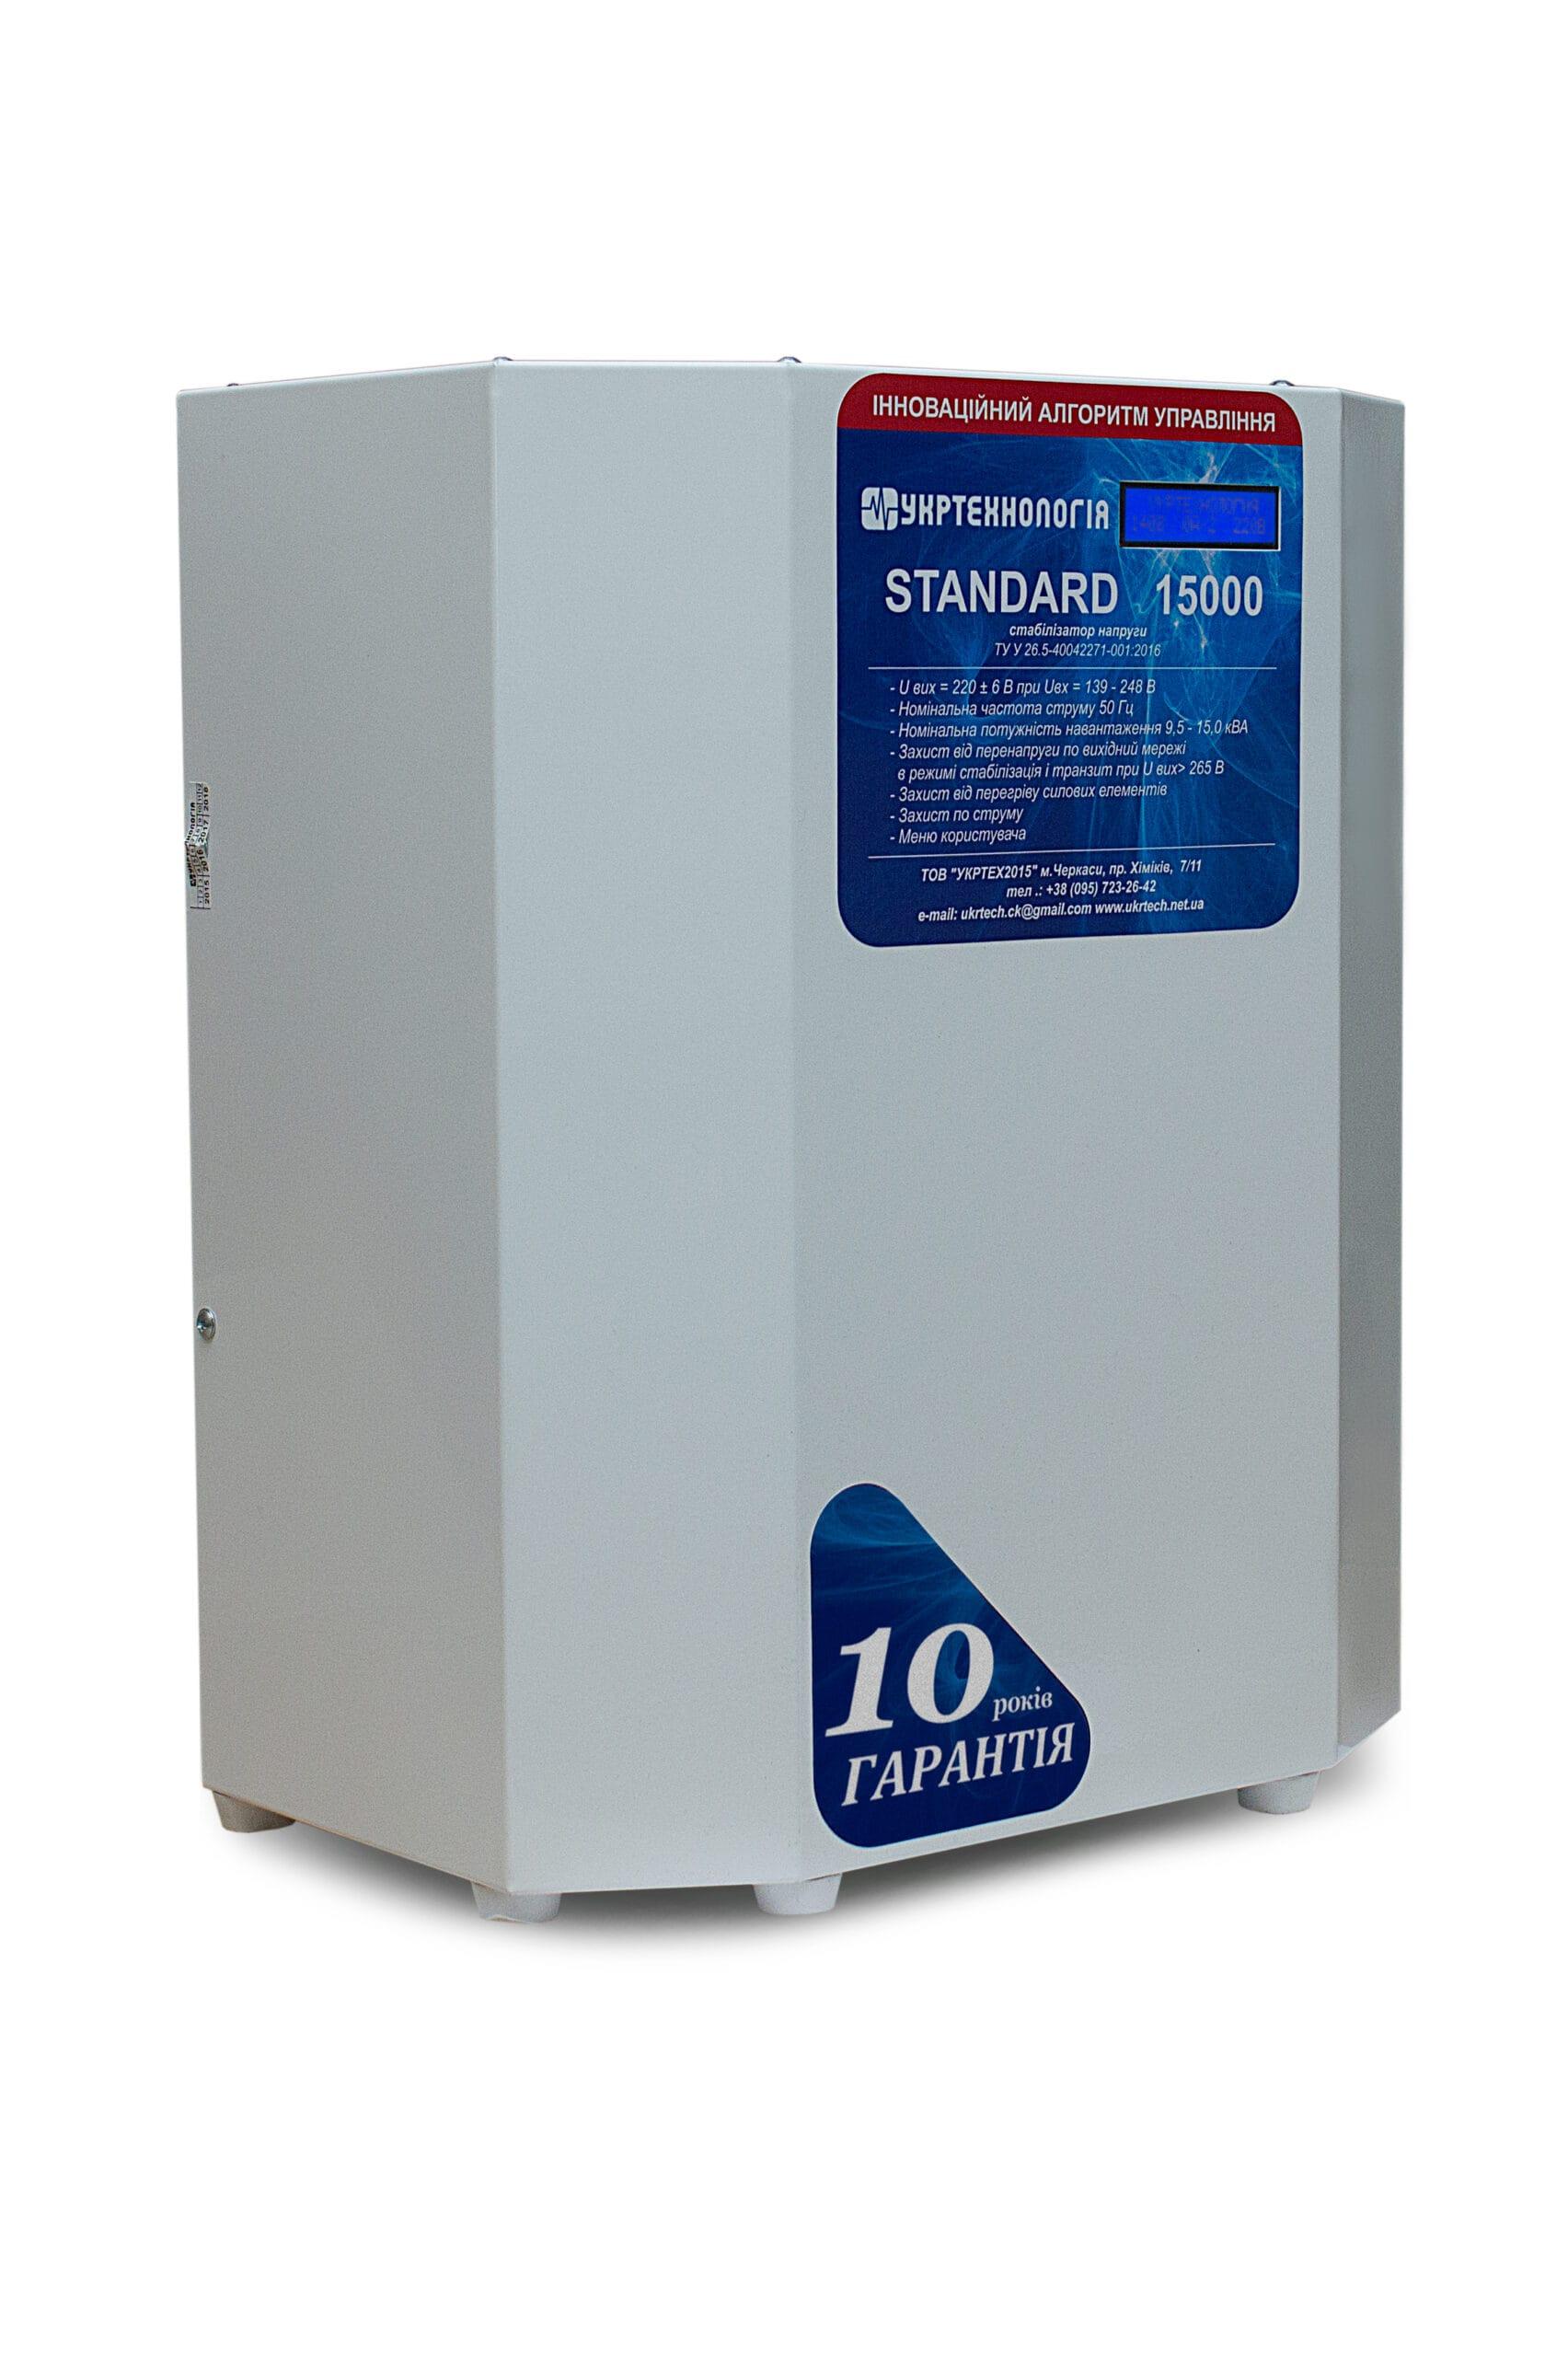 Стабилизаторы напряжения - Стабилизатор напряжения 15 кВт STANDARD  000001400 - Фото 2